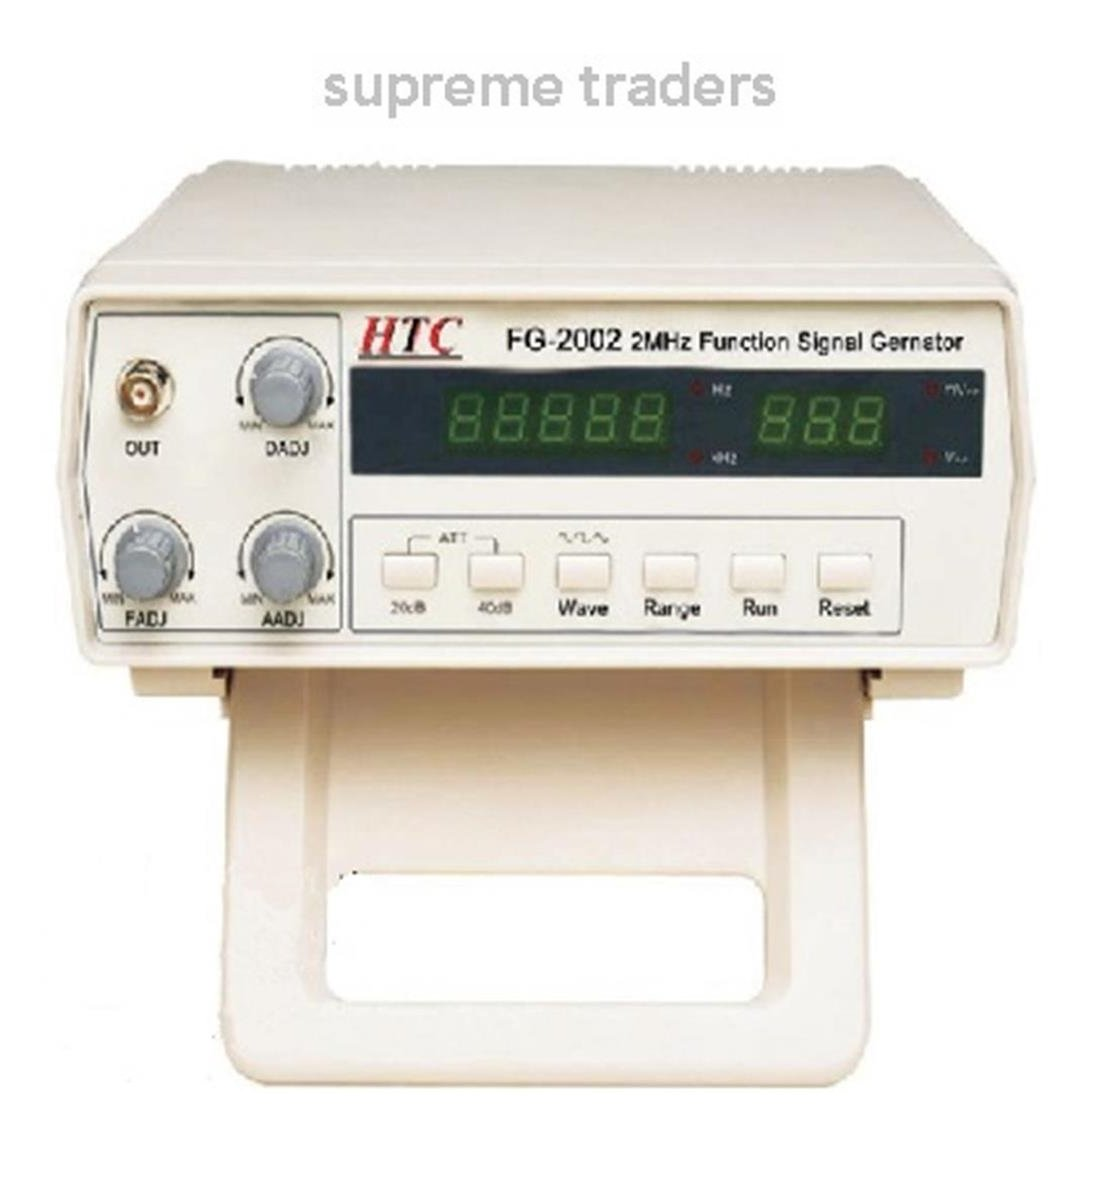 HTC FG-2002 Function Generator